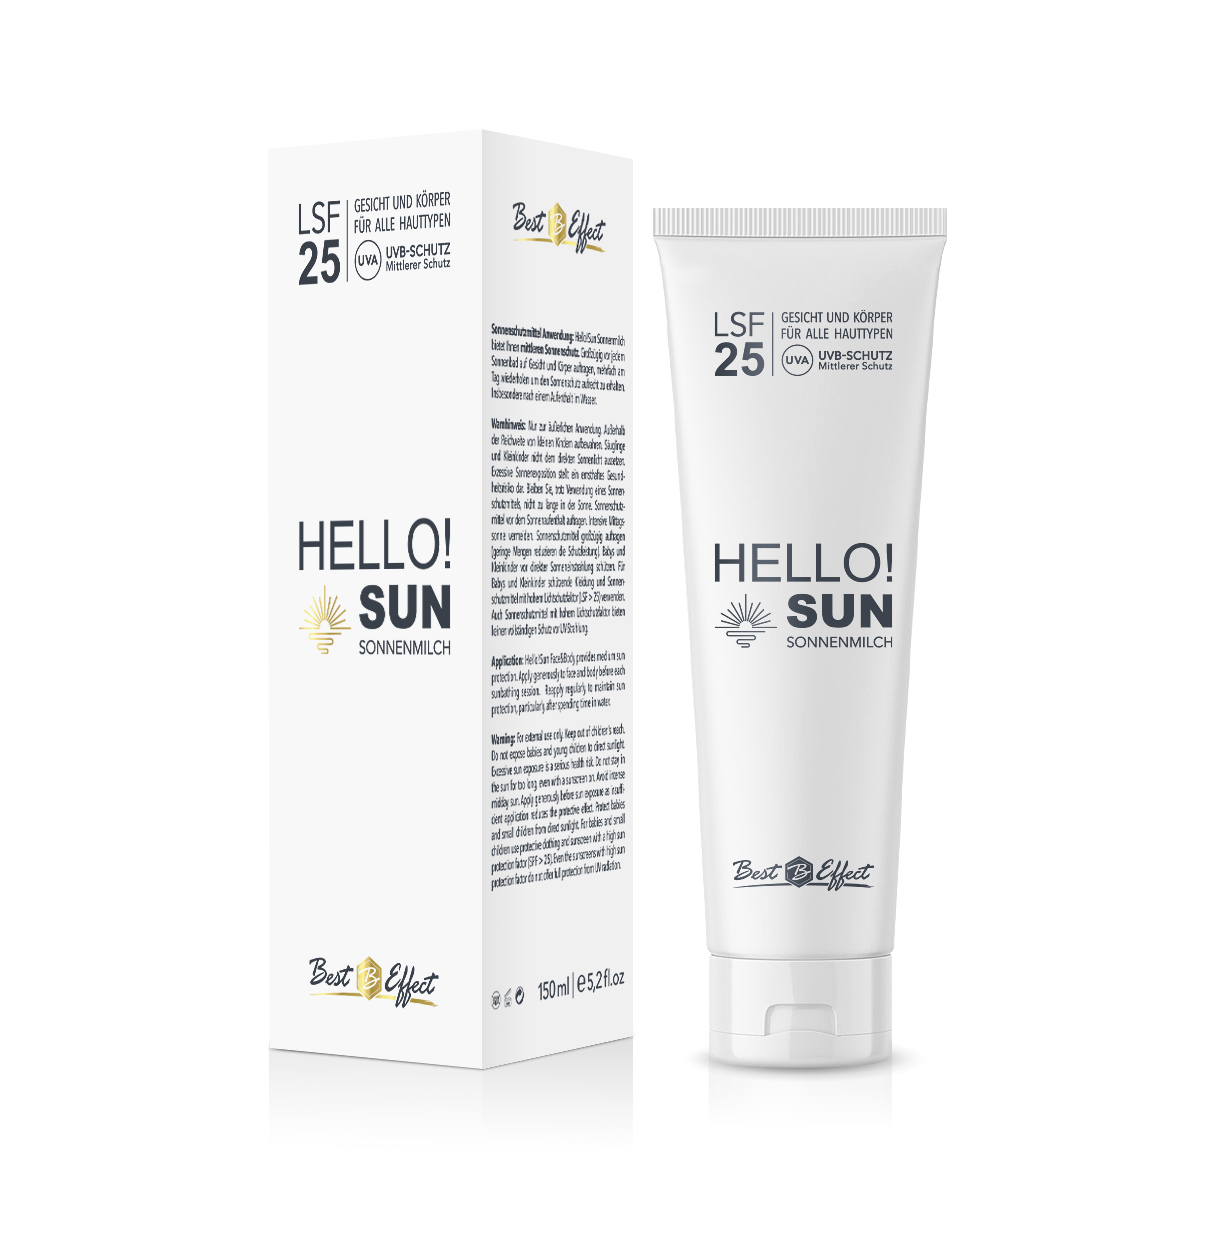 Hello!Sun Sonnenmilch